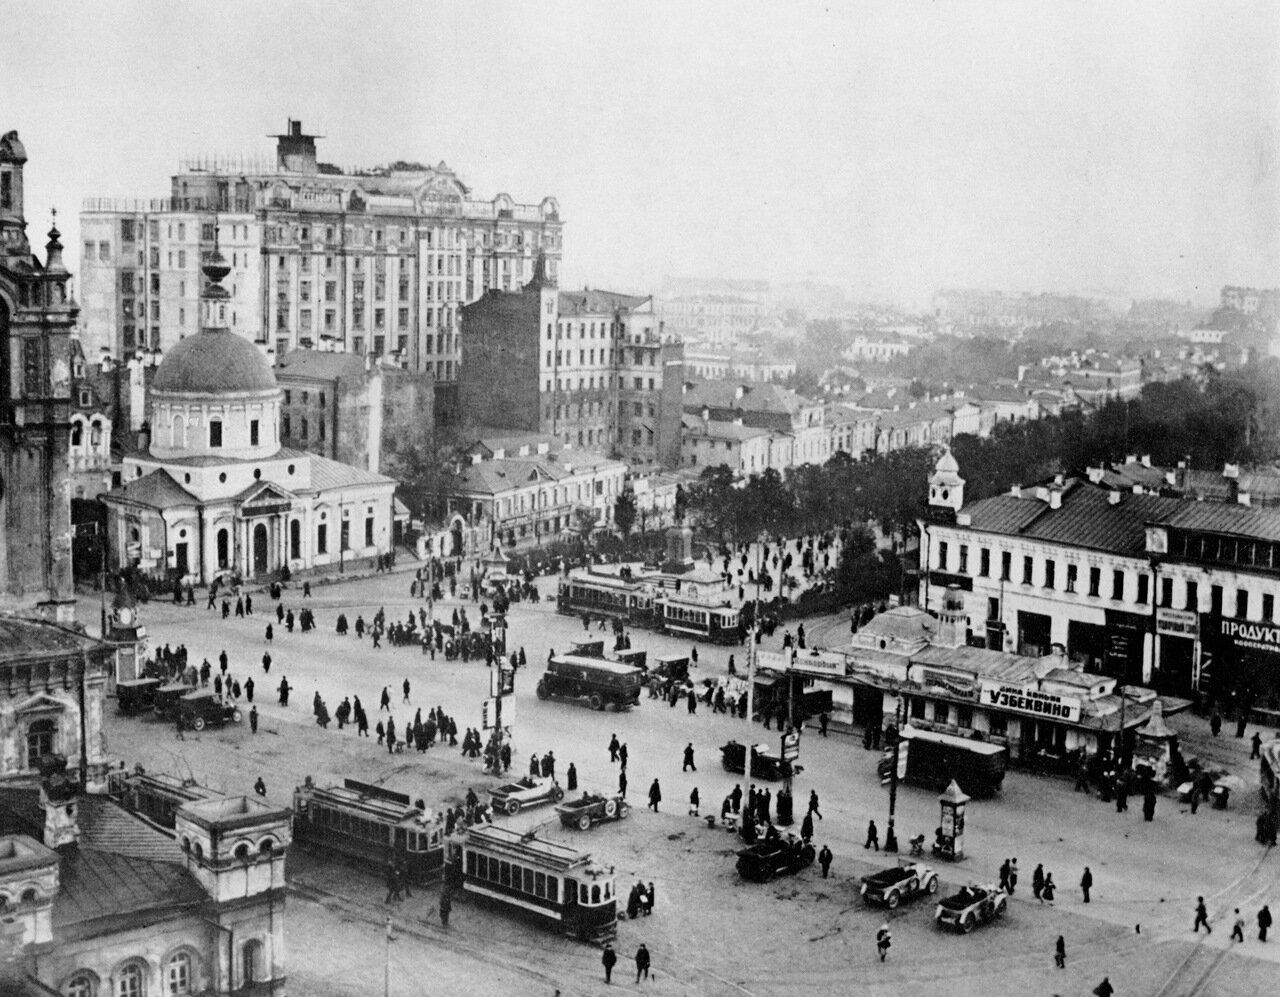 Москва. Площадь Пушкина. 20-е годы.